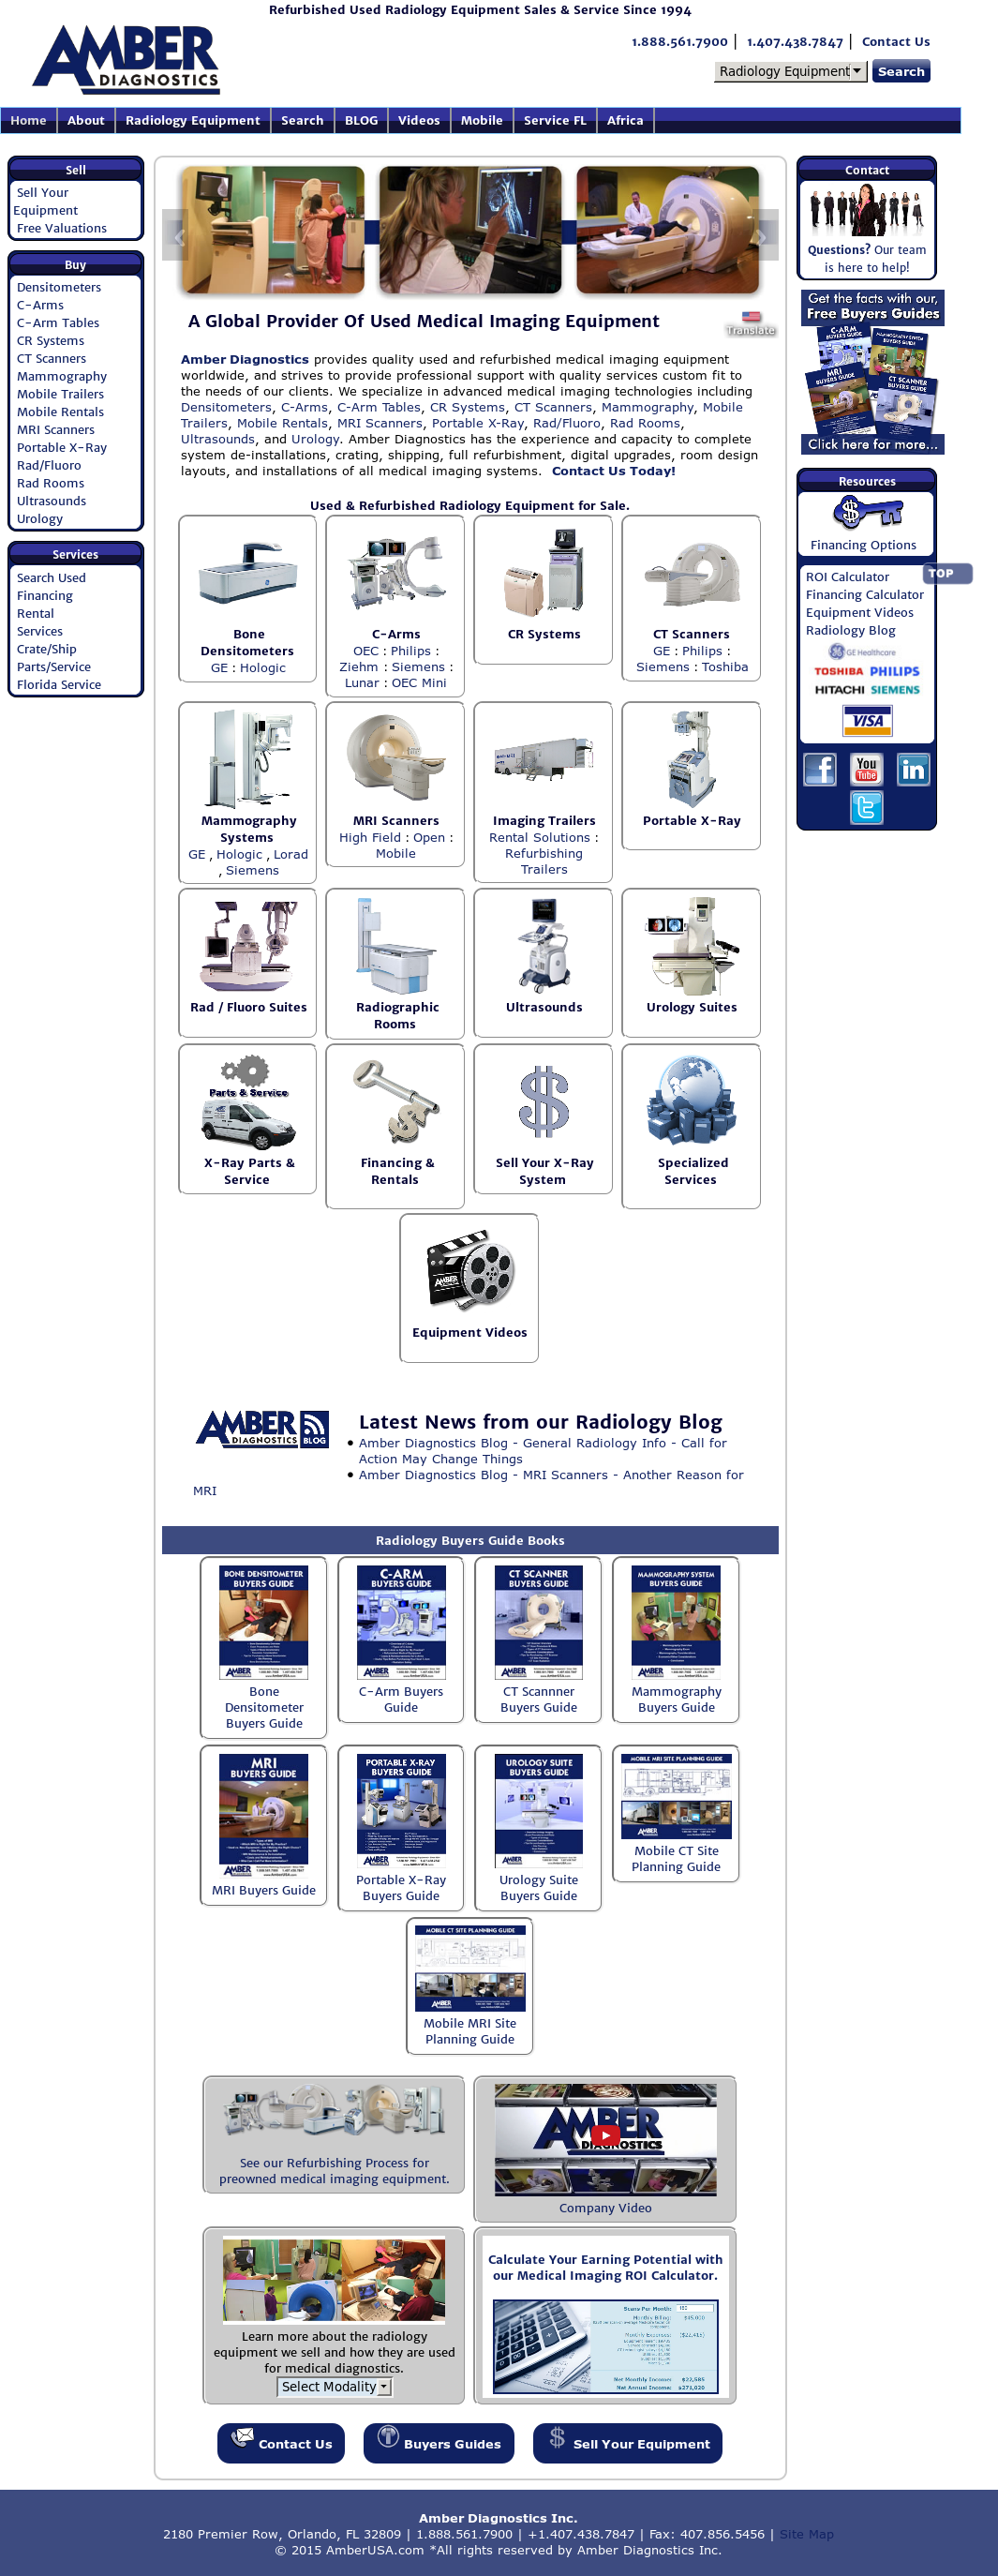 Amber Diagnostics Competitors, Revenue and Employees - Owler